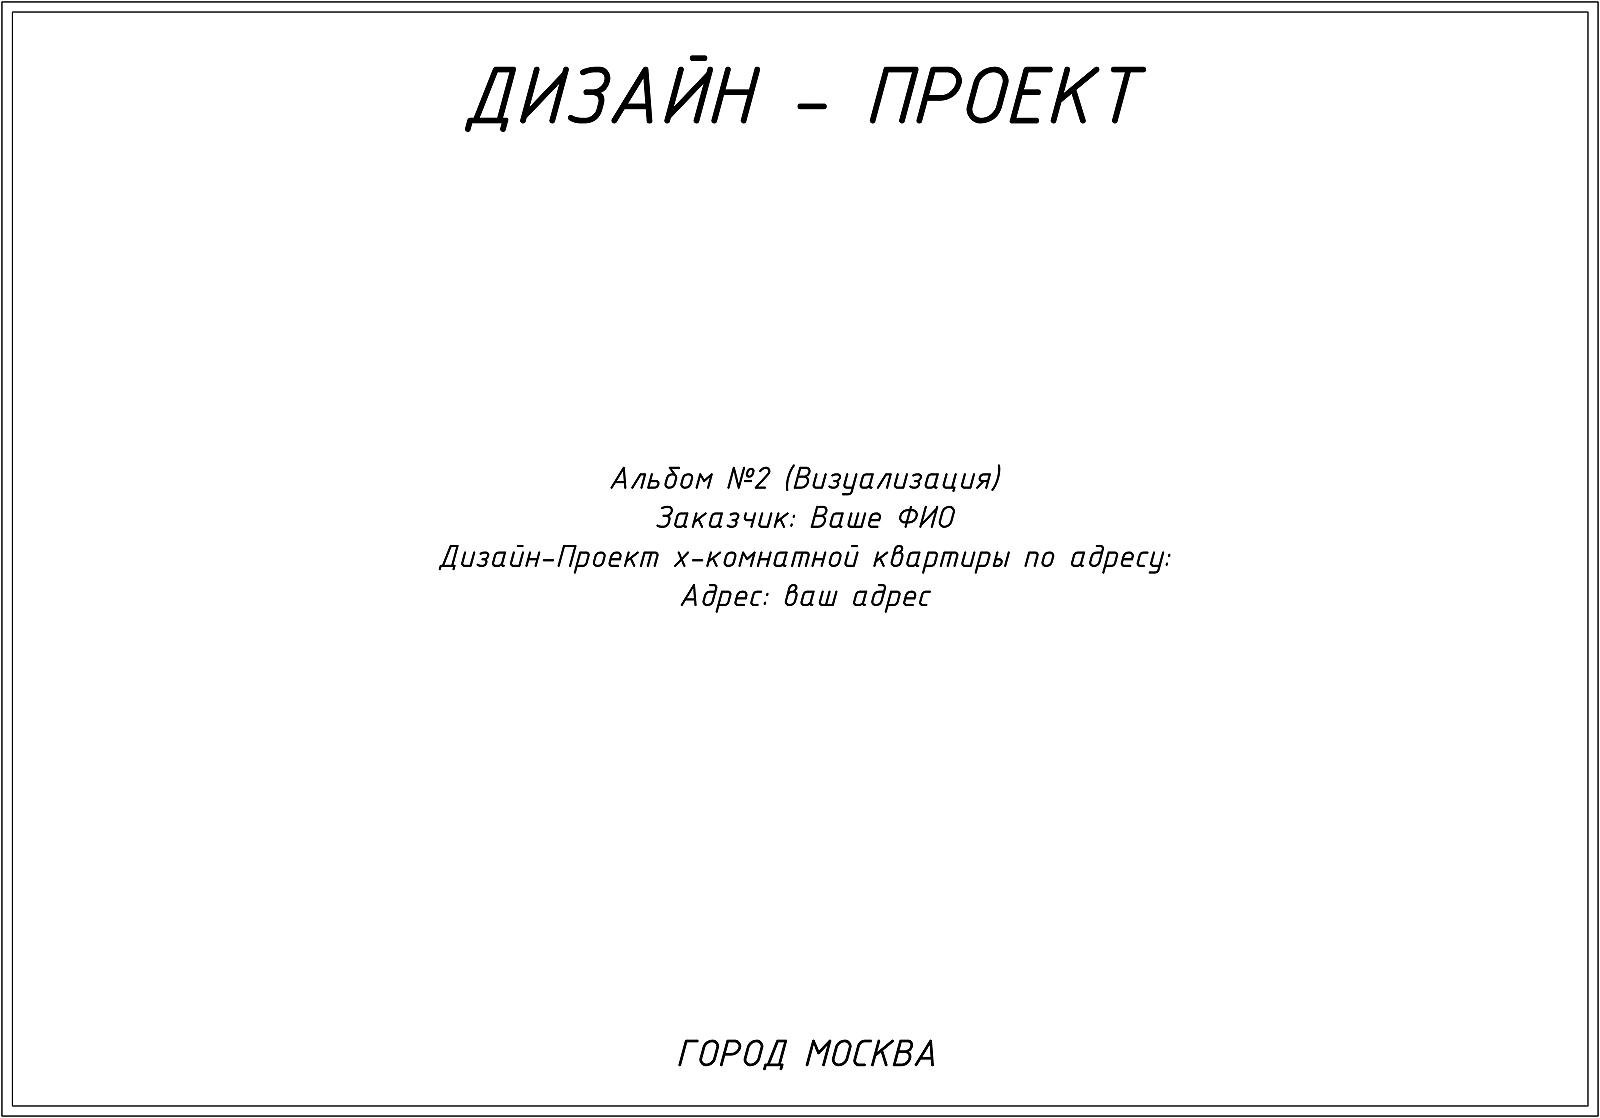 Образец титульного листа проекта rabpartlericlan